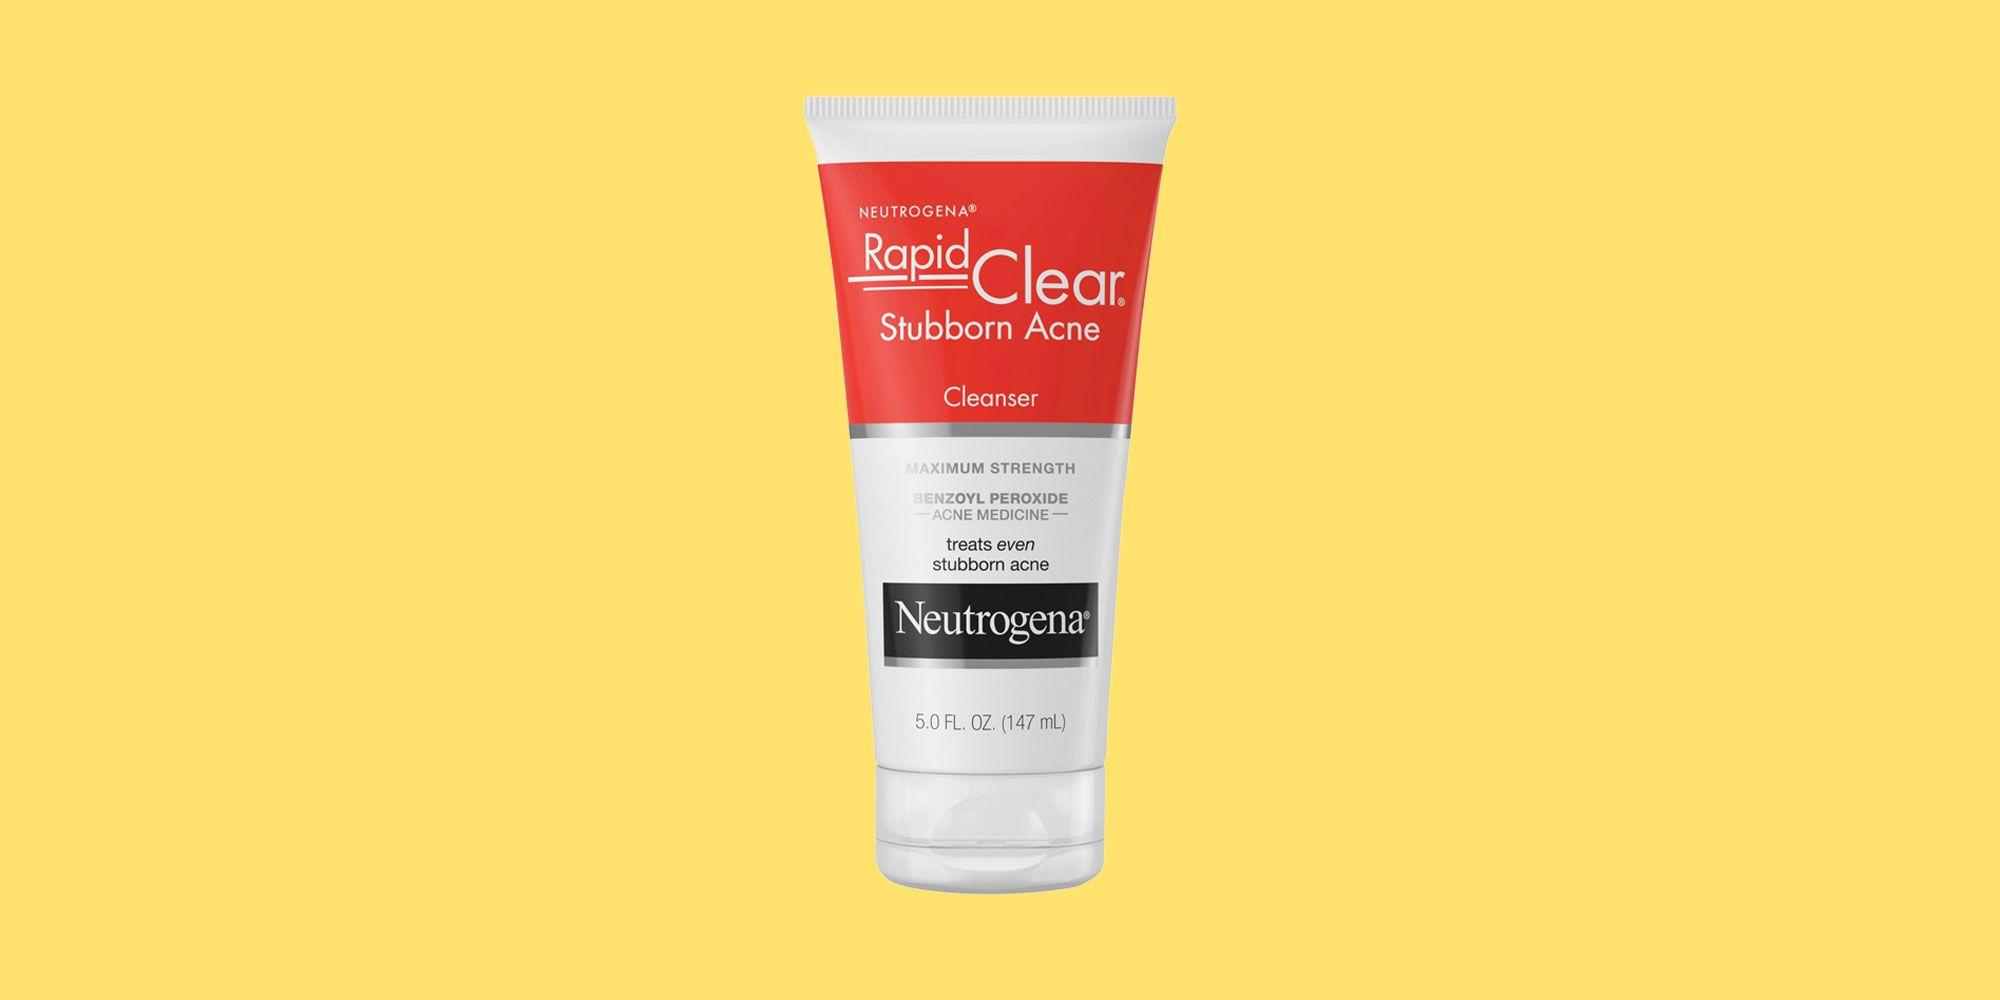 Neutrogena Rapid Clear Stubborn Acne Face Wash